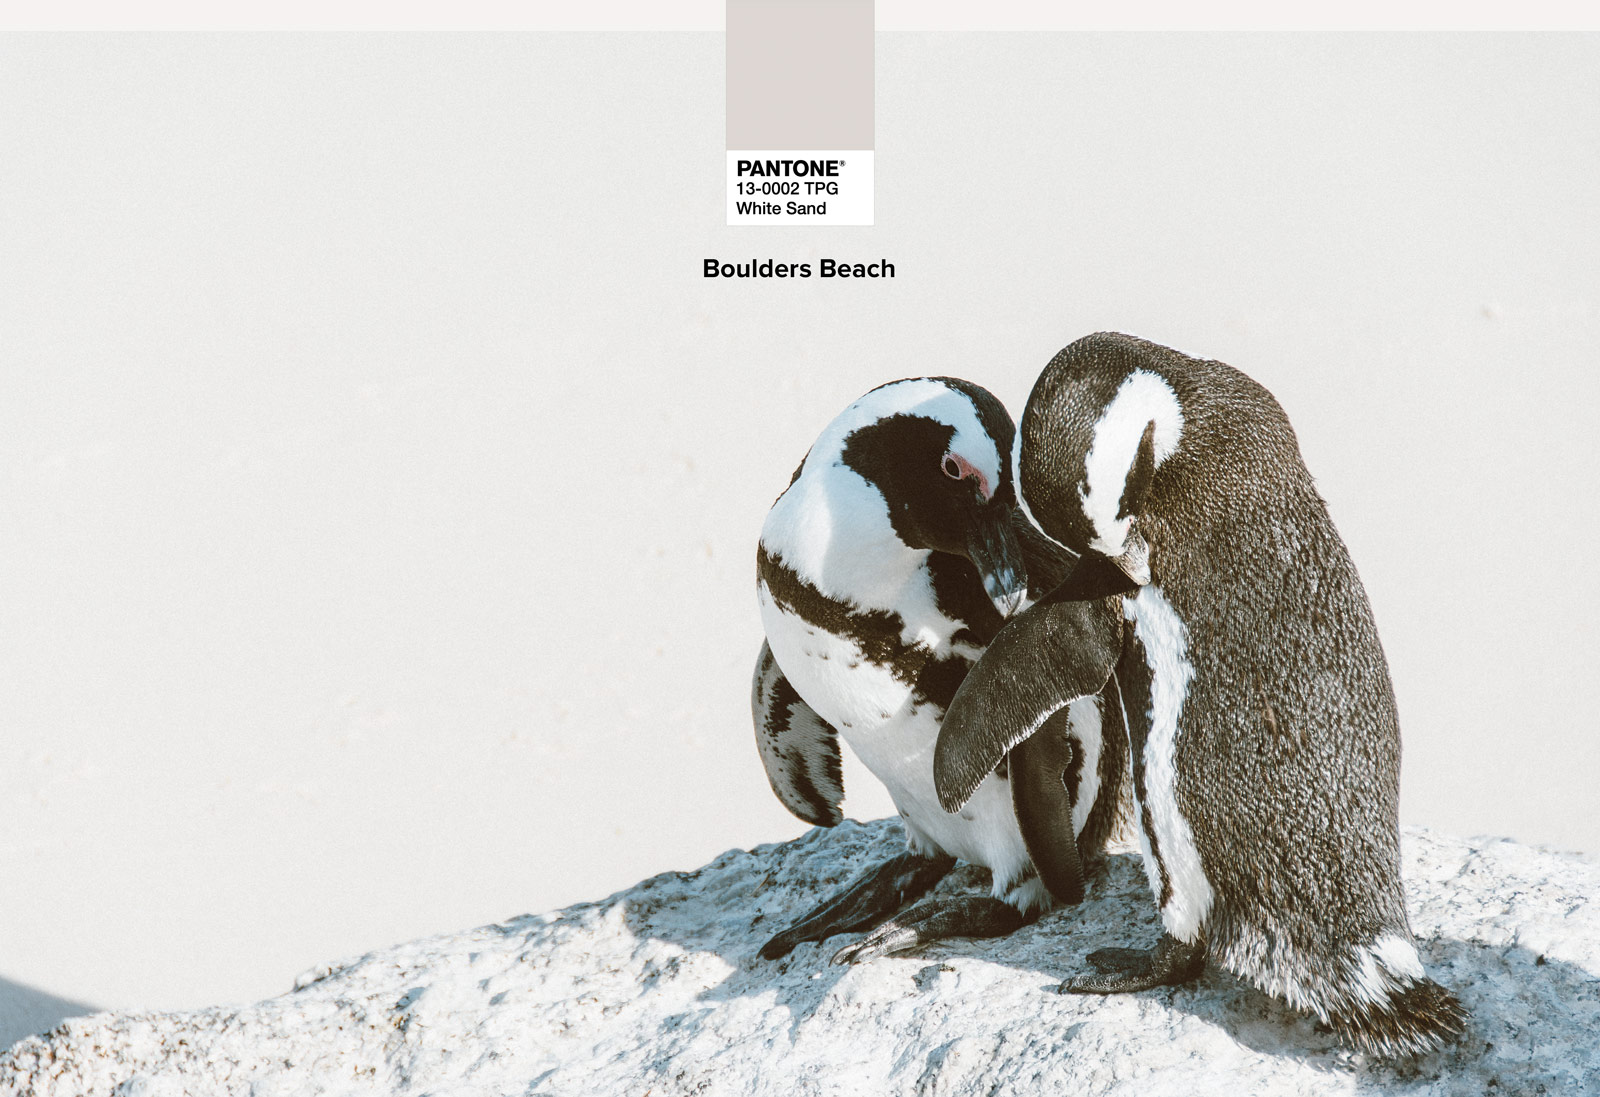 sa-kapstadt-boulders-beach-01-wp